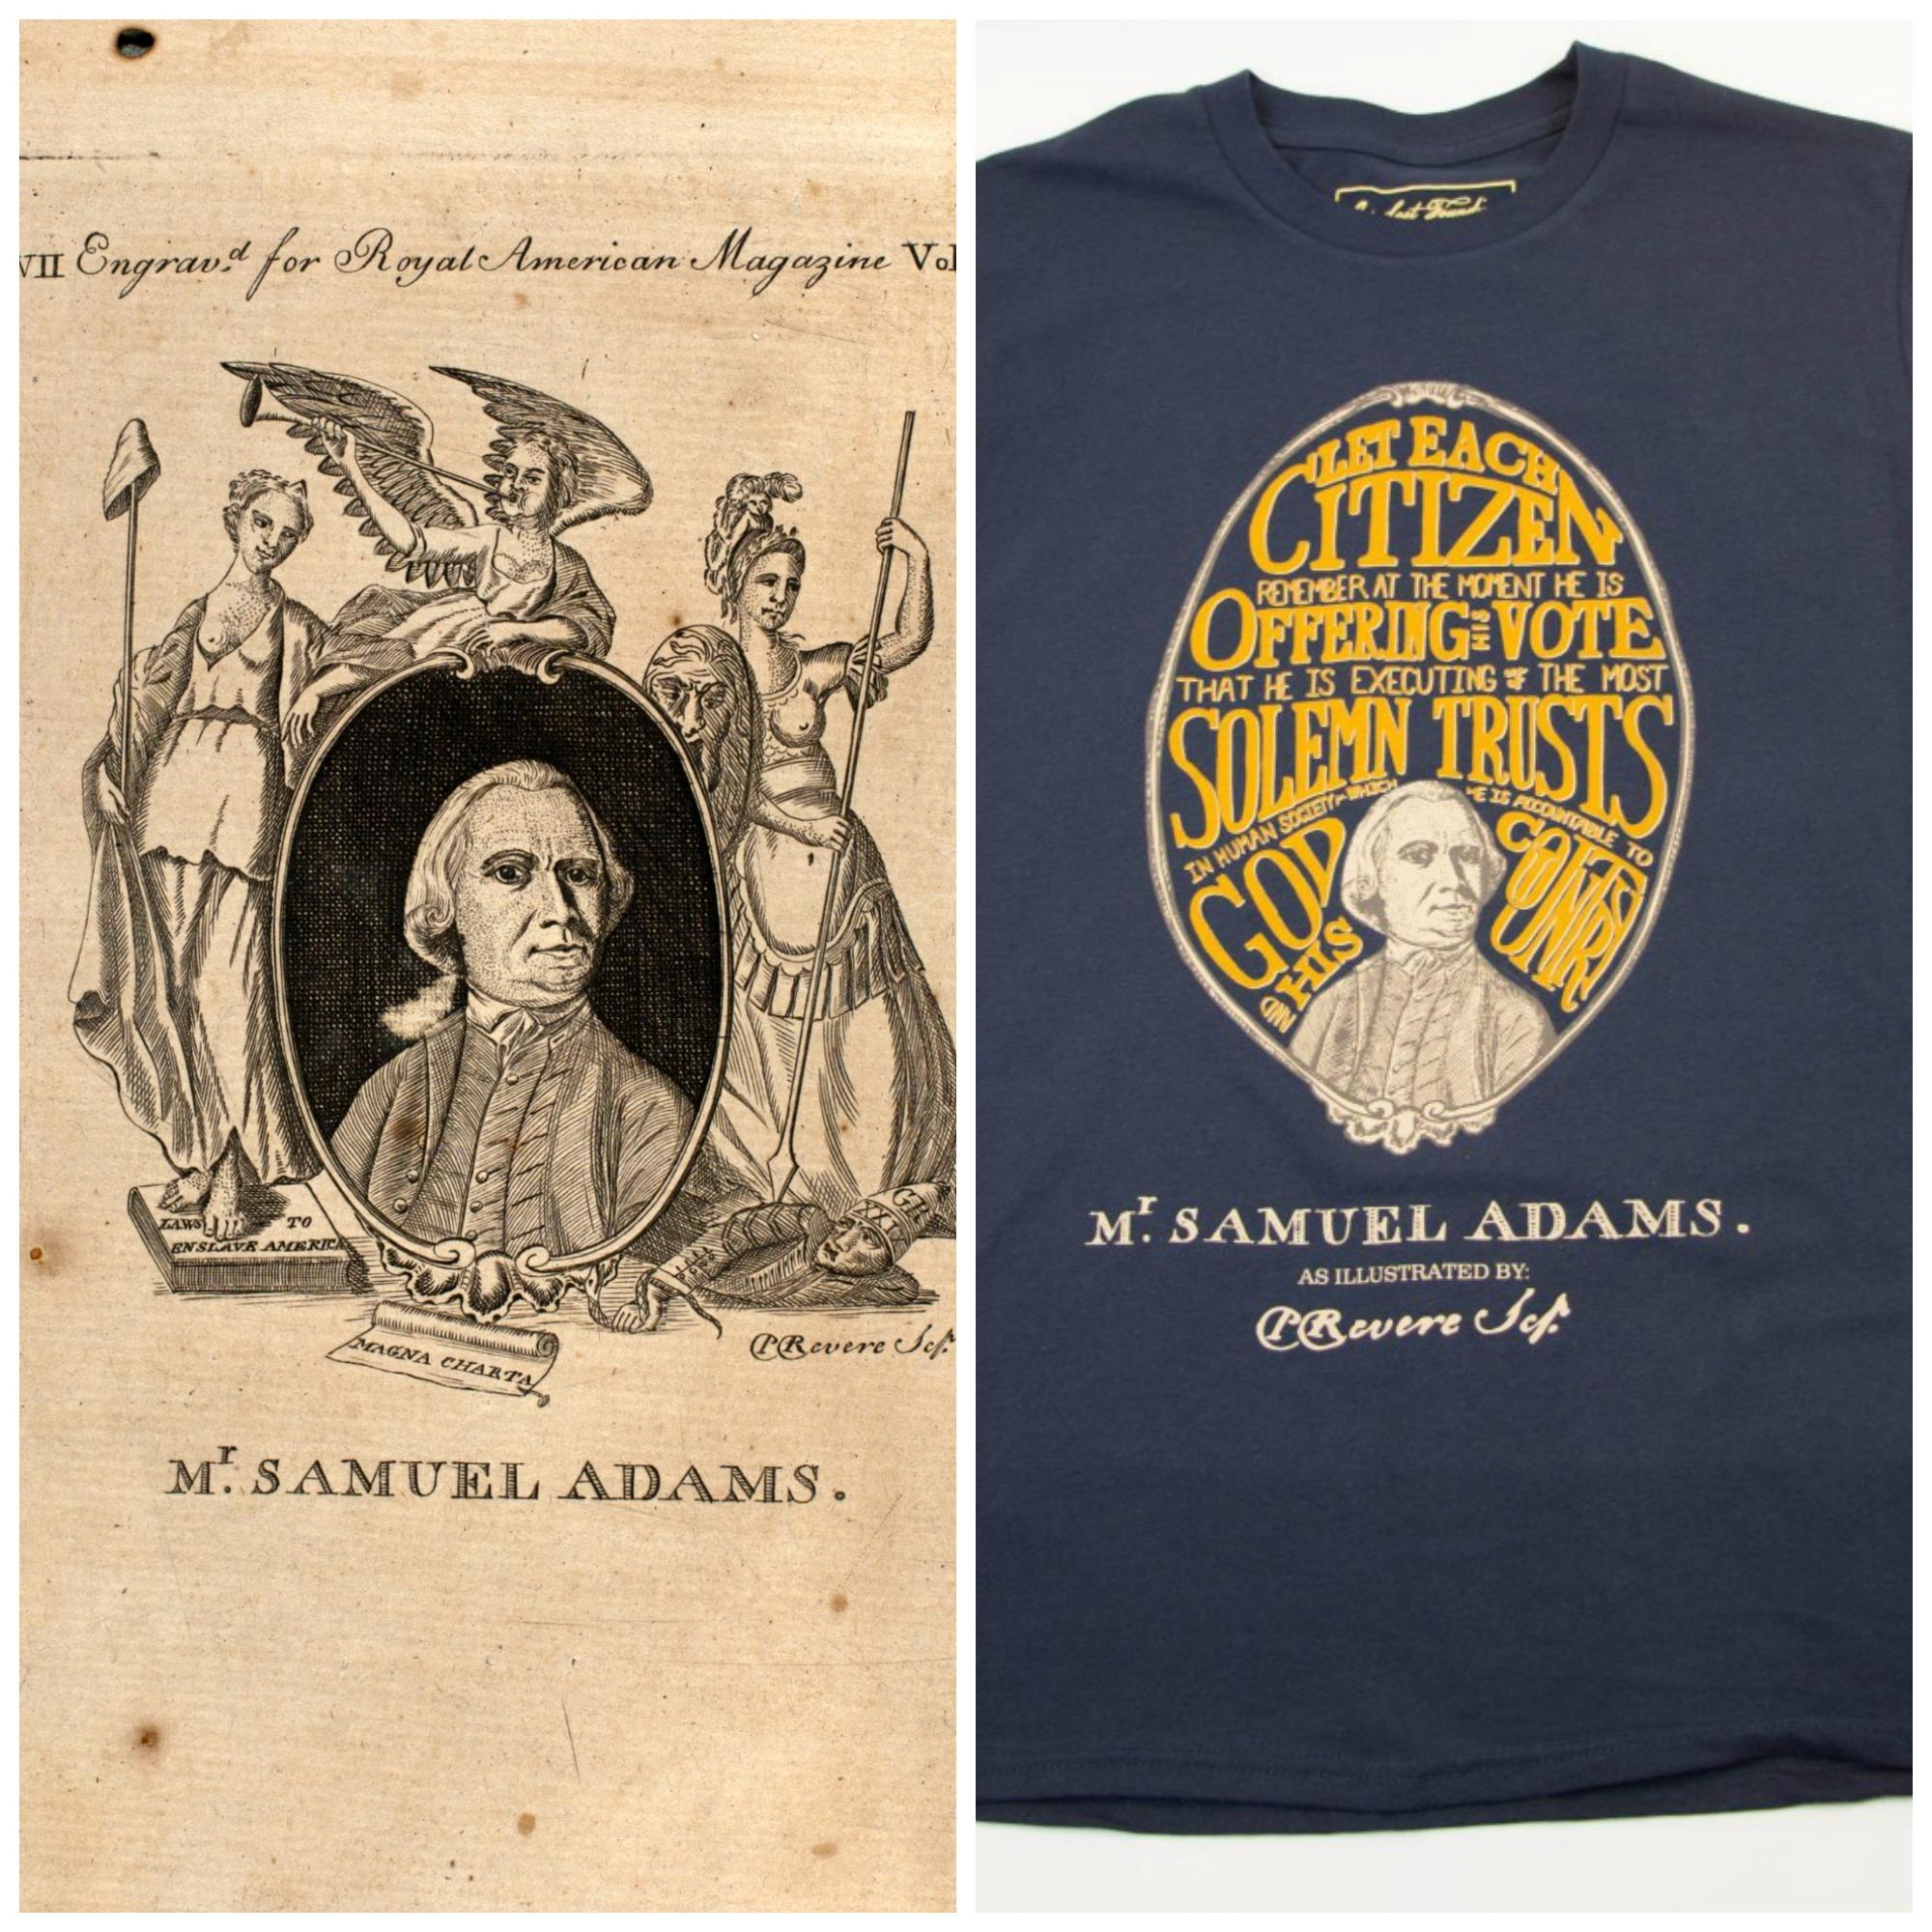 Samuel Adams Paul Revere artwork